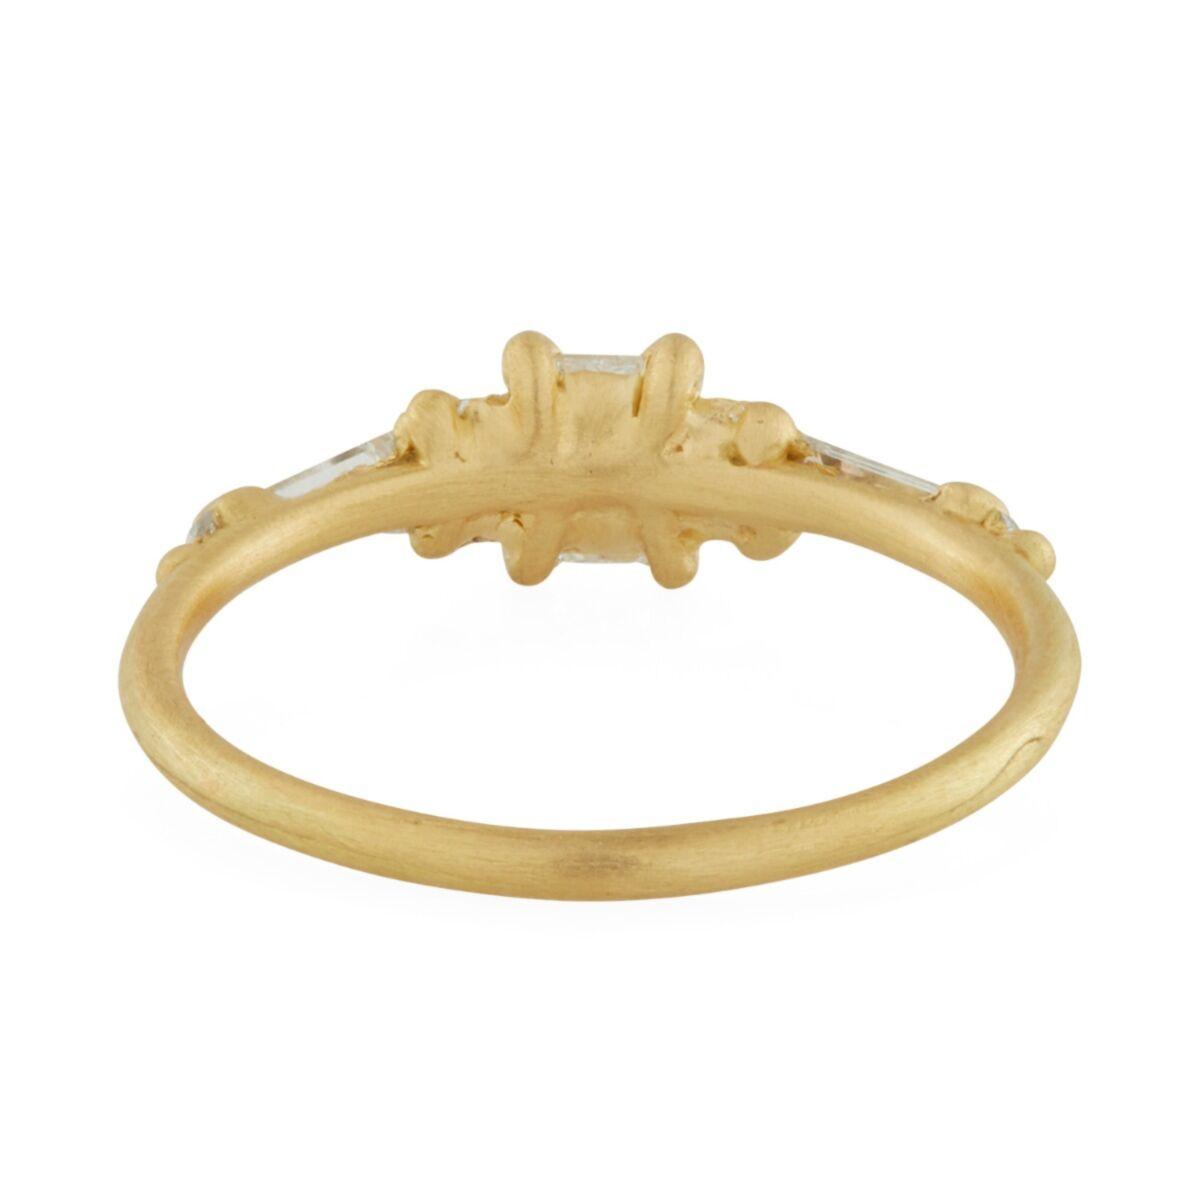 Phaedra Ring image